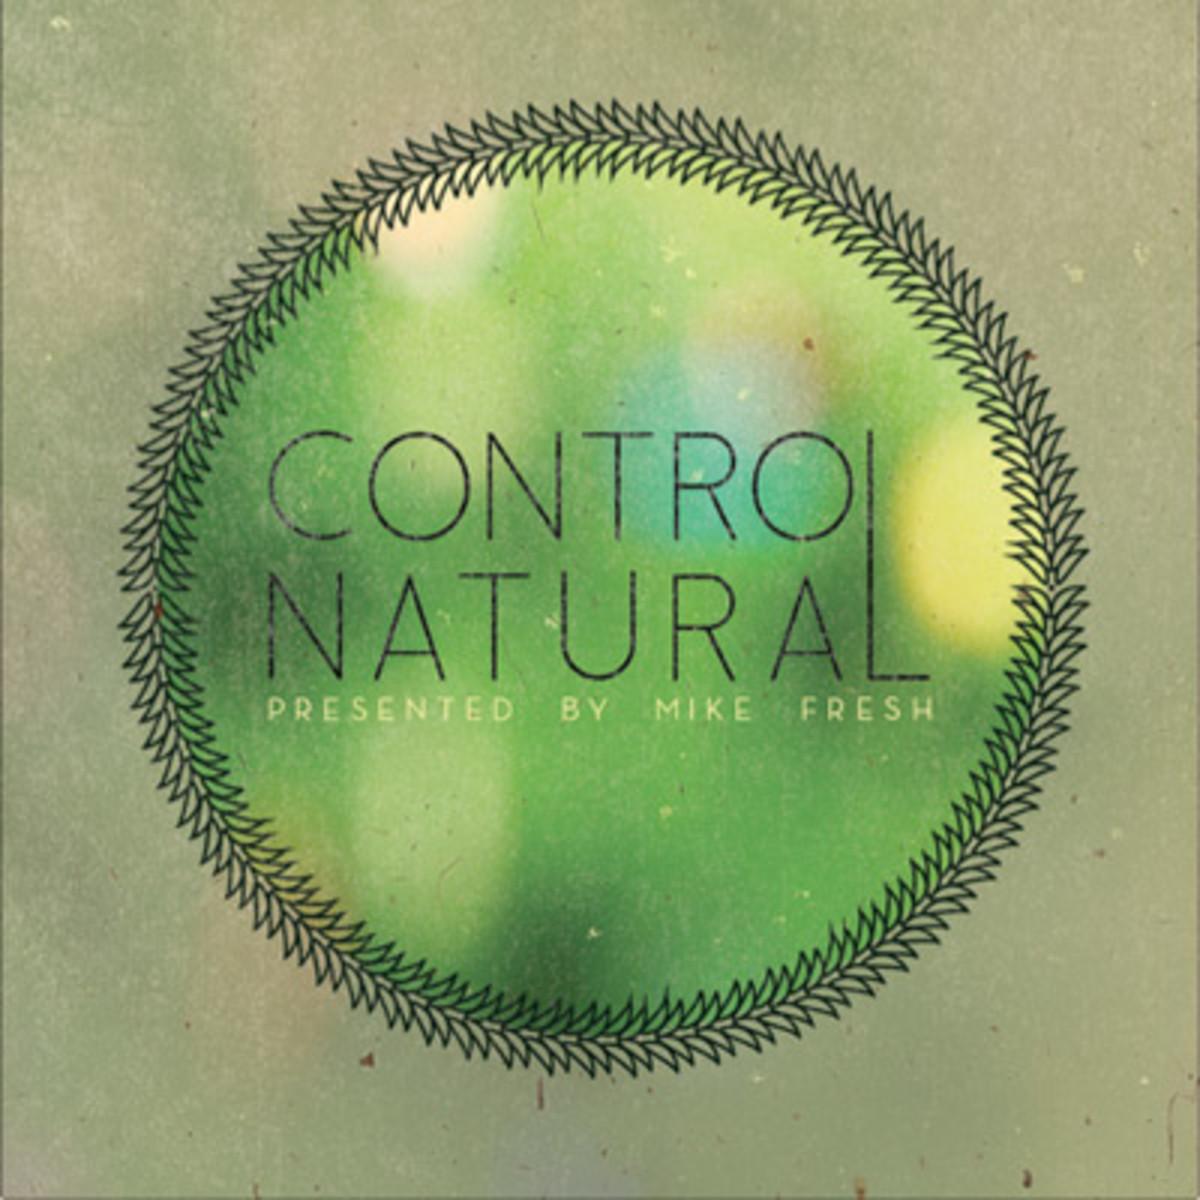 controlnatural.jpg